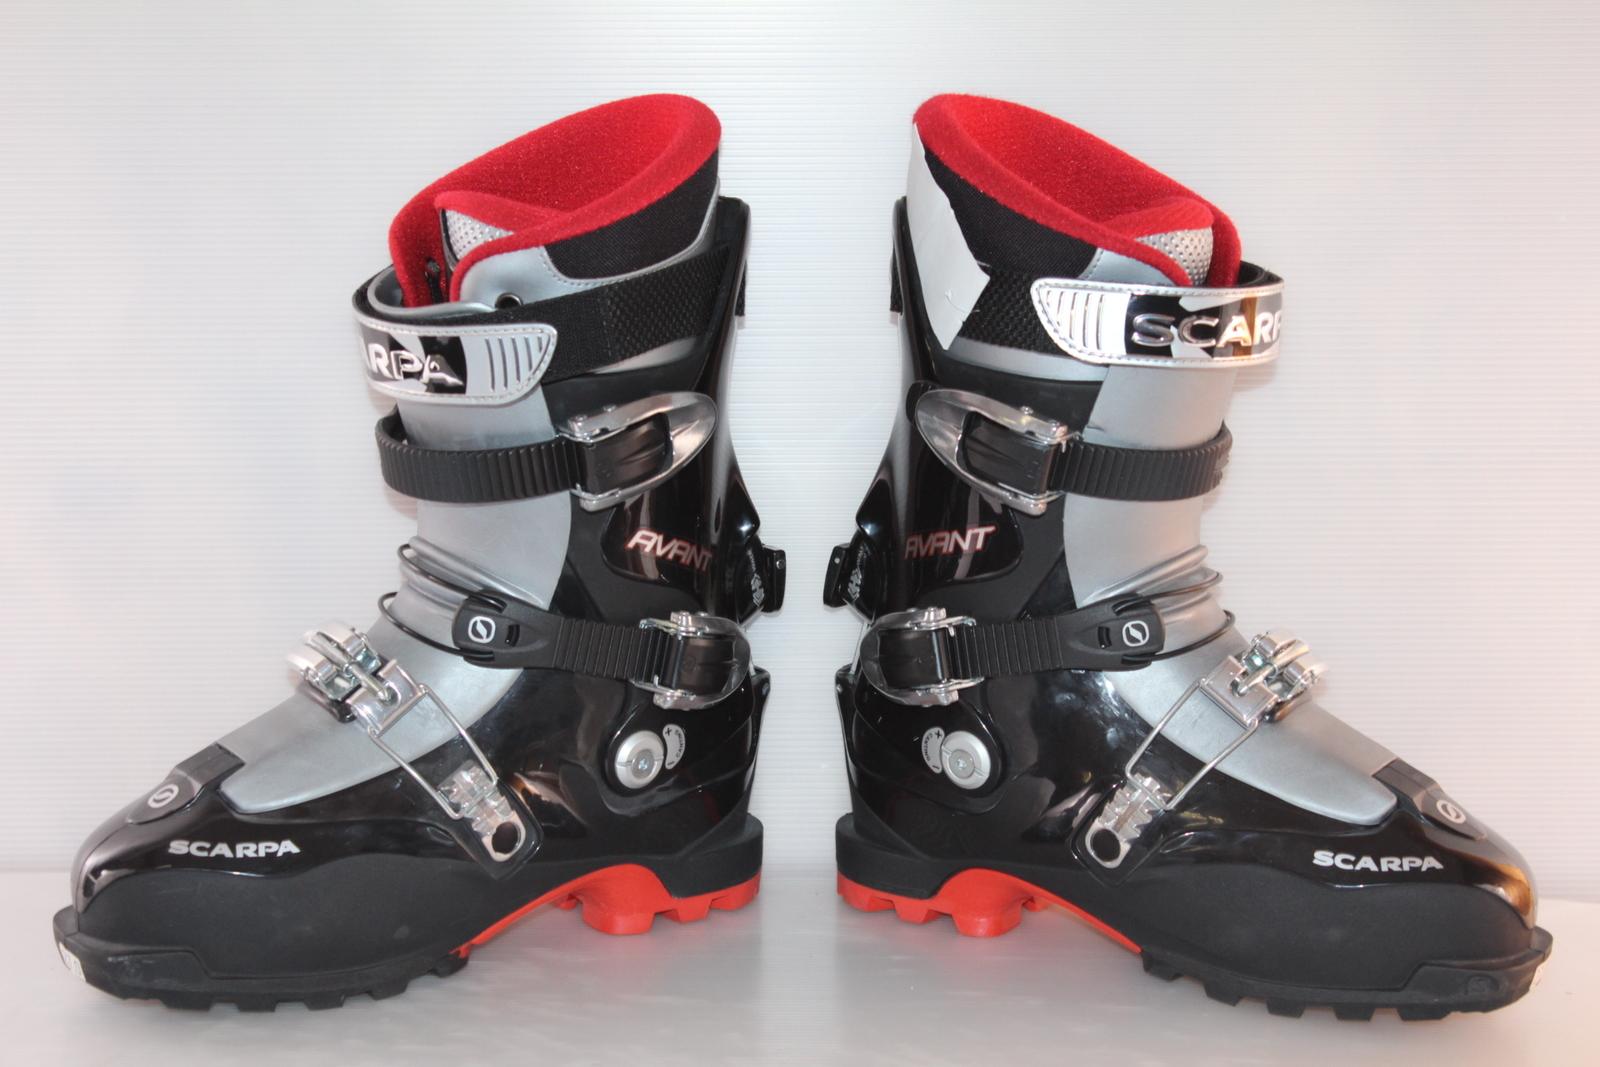 Skialpové boty Scarpa Avant - skialp vel. EU42